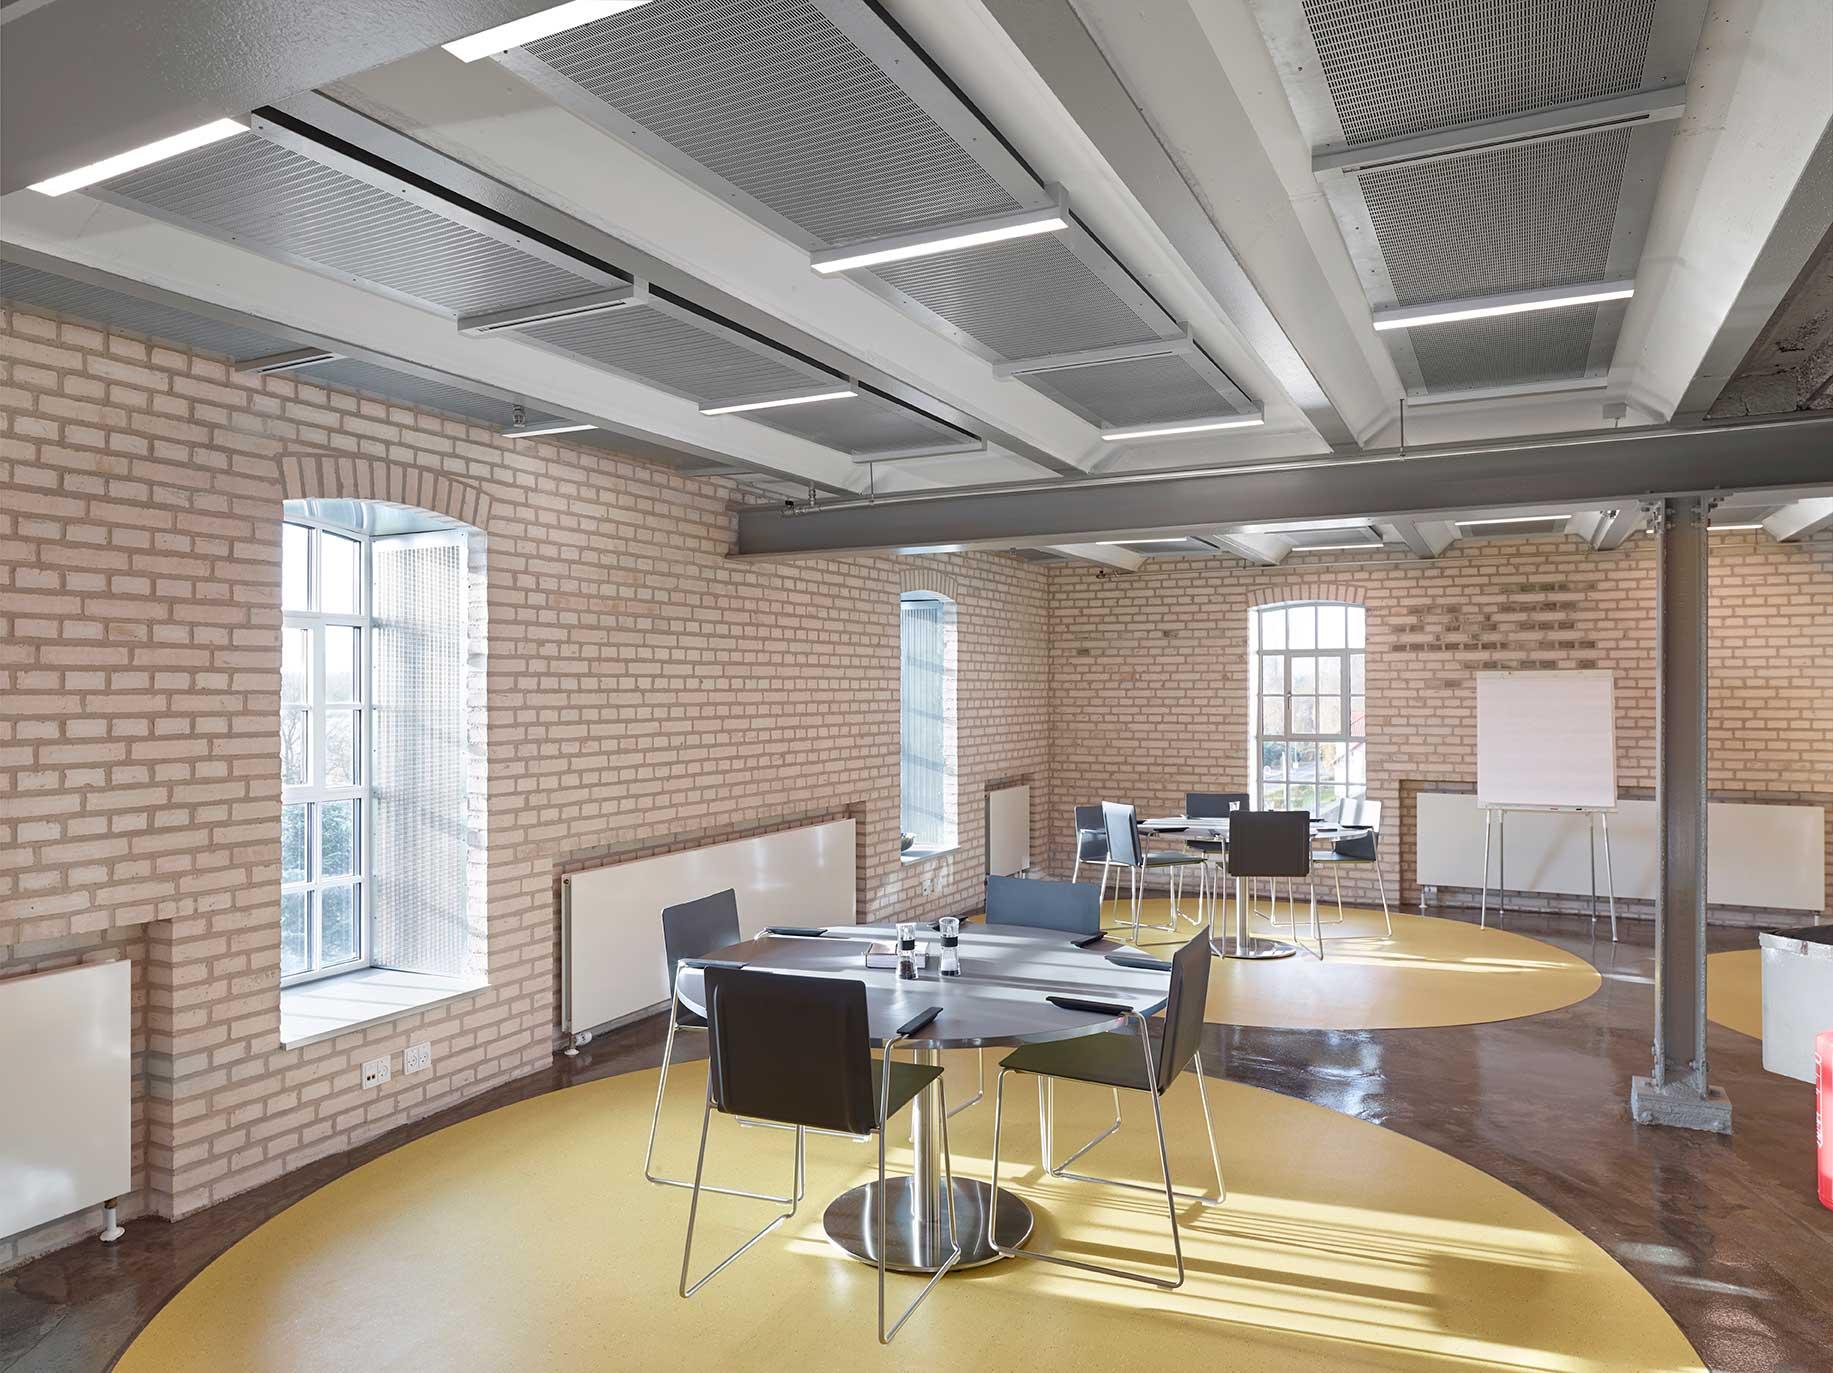 Matric lampe specialmontering indbygget i loft i frokoststue - Luminex